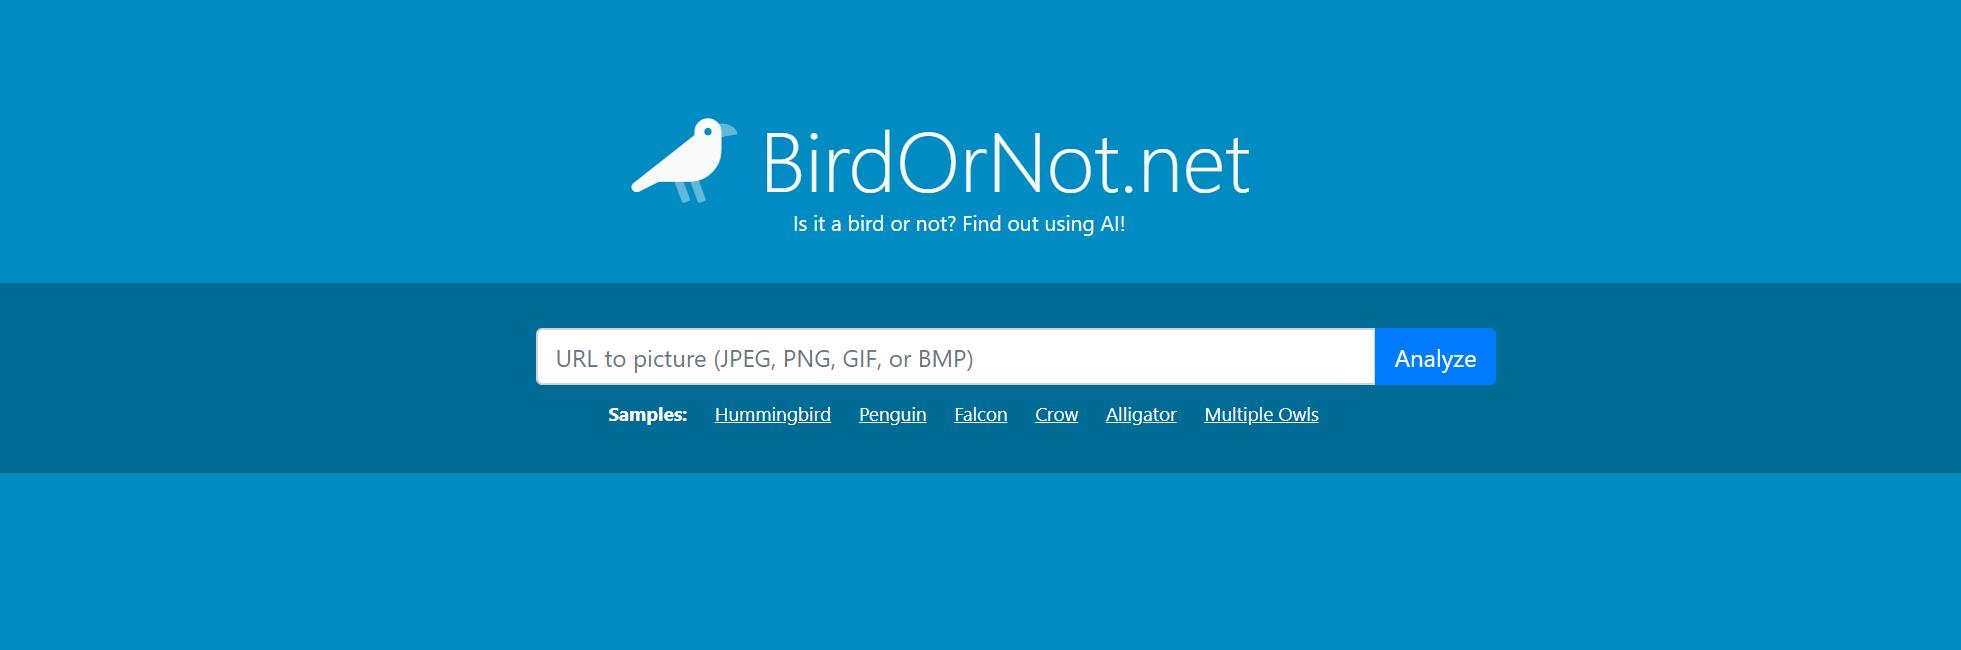 BirdOrNot.net